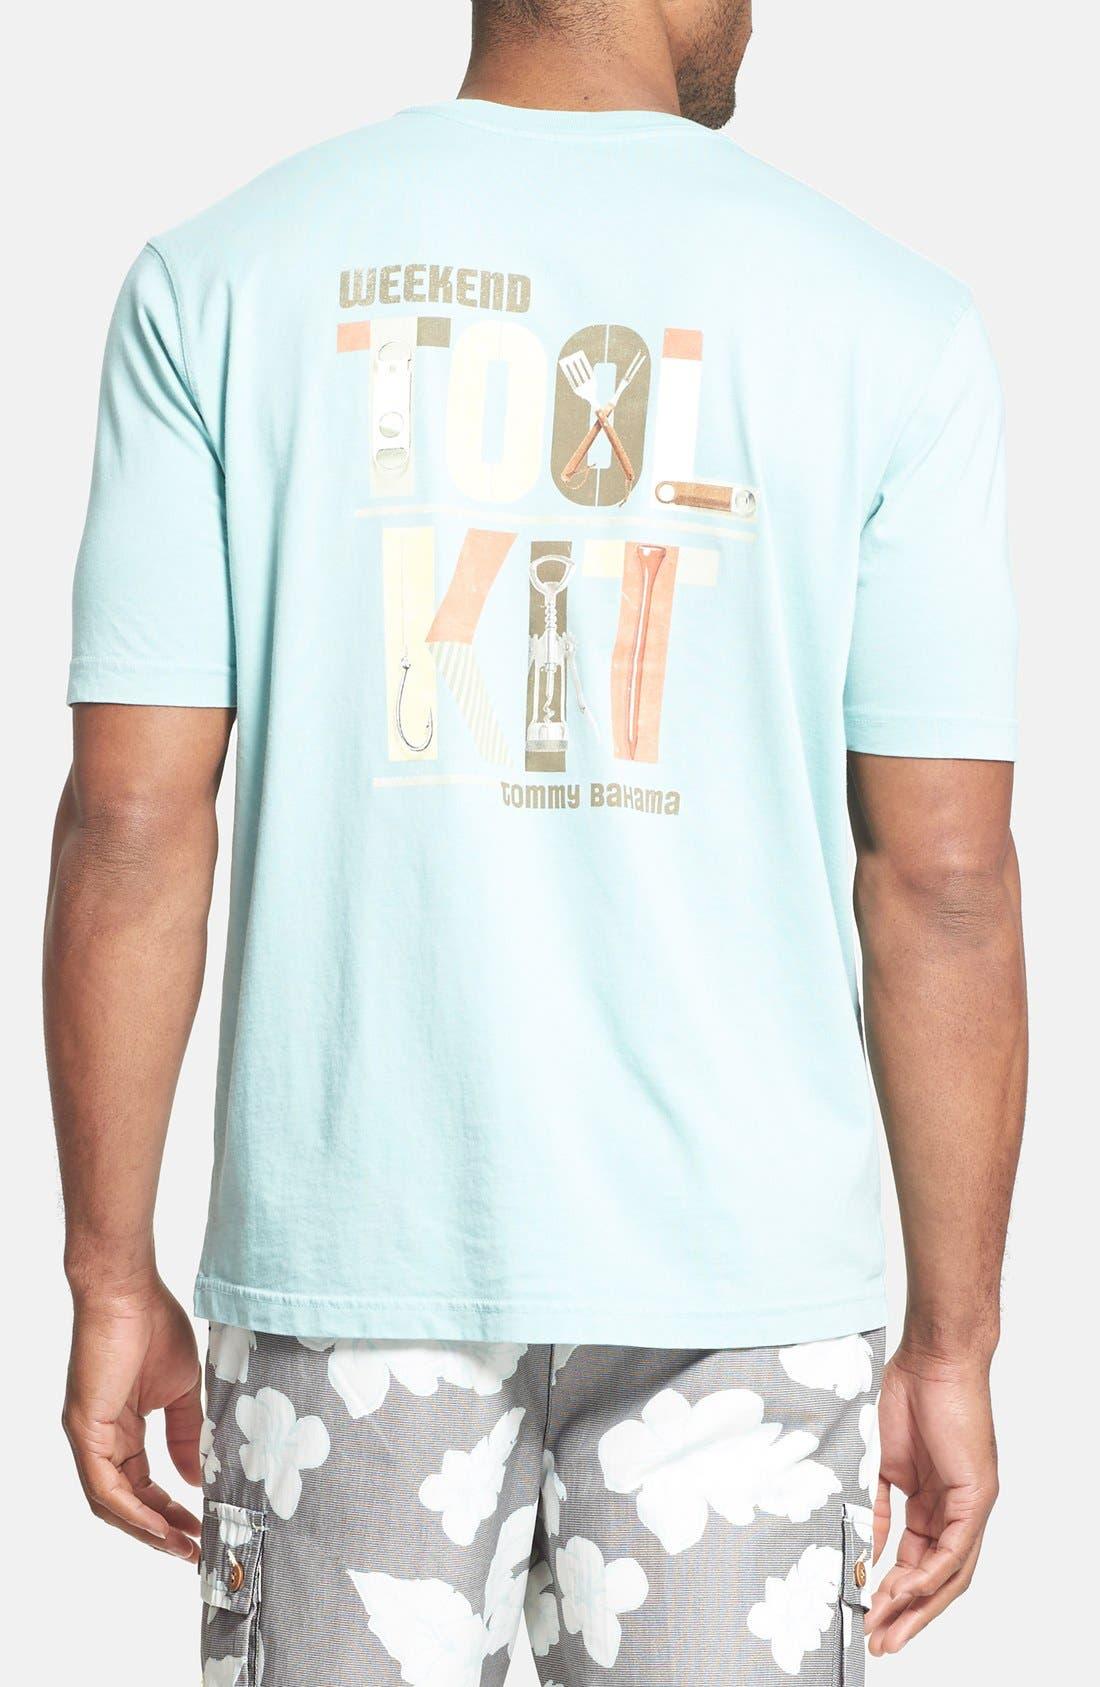 Alternate Image 2  - Tommy Bahama 'Weekend Tool Kit' Regular Fit T-Shirt